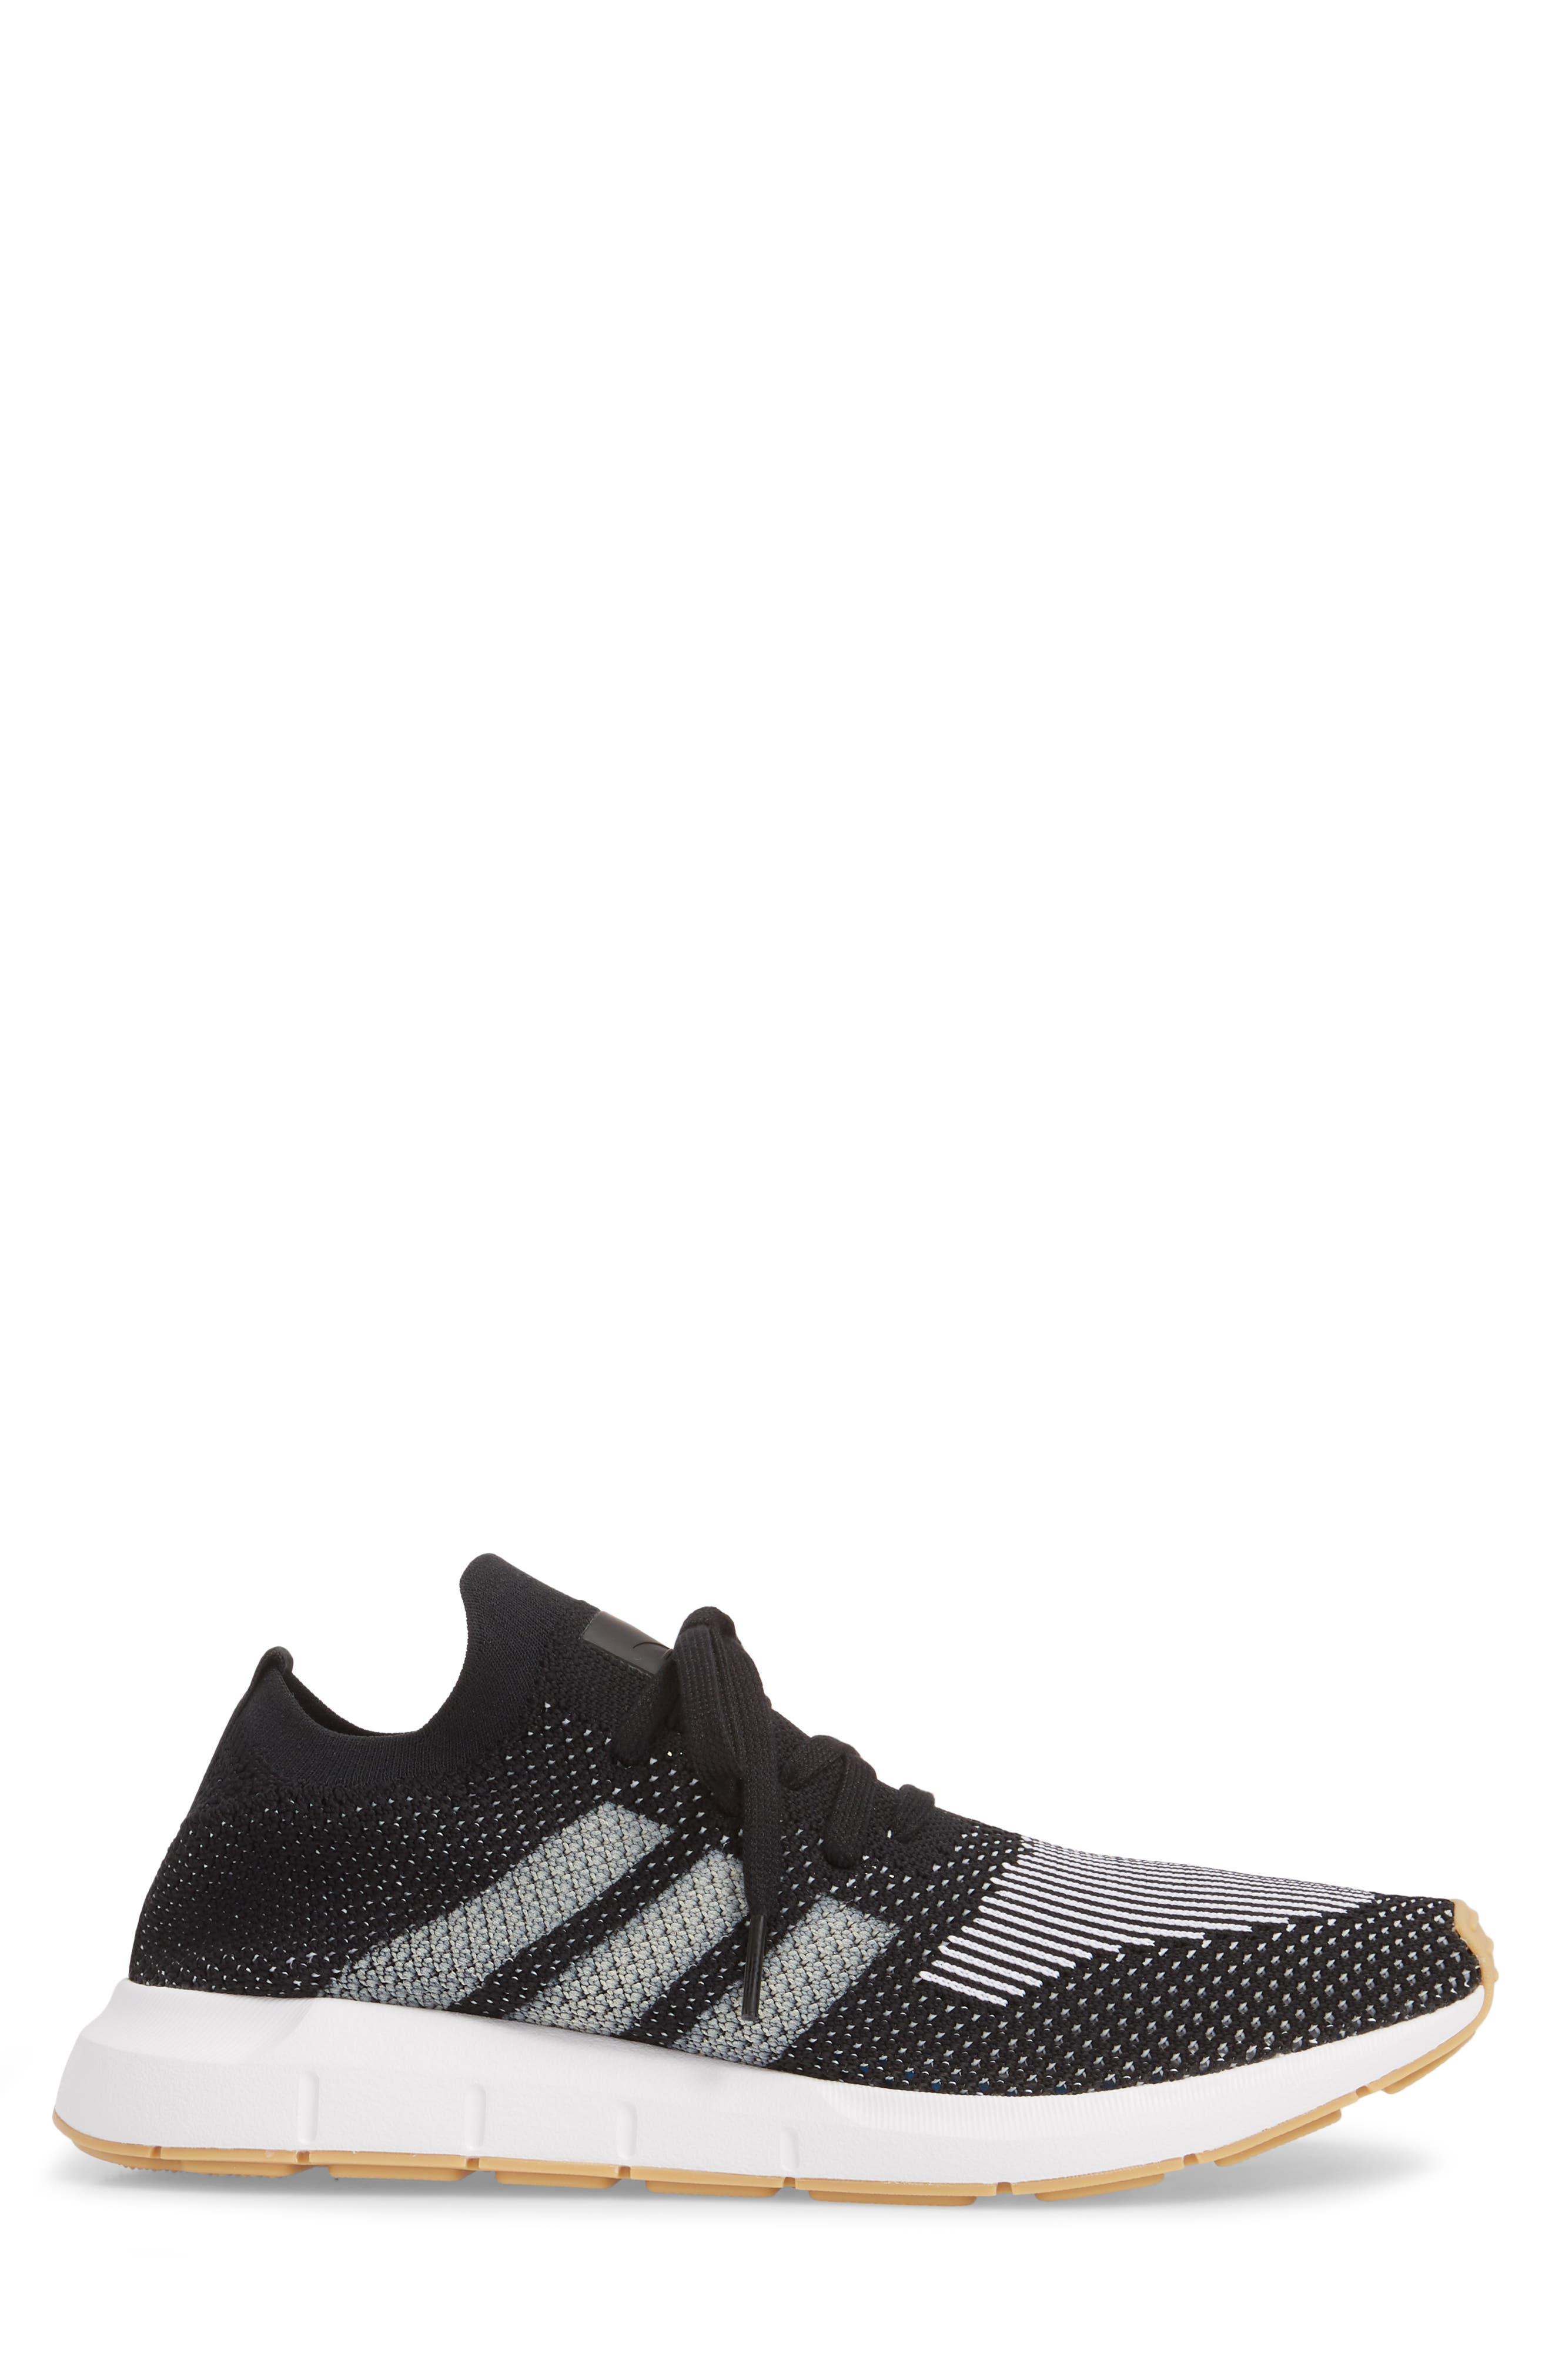 Swift Run Primeknit Sneaker,                             Alternate thumbnail 3, color,                             001